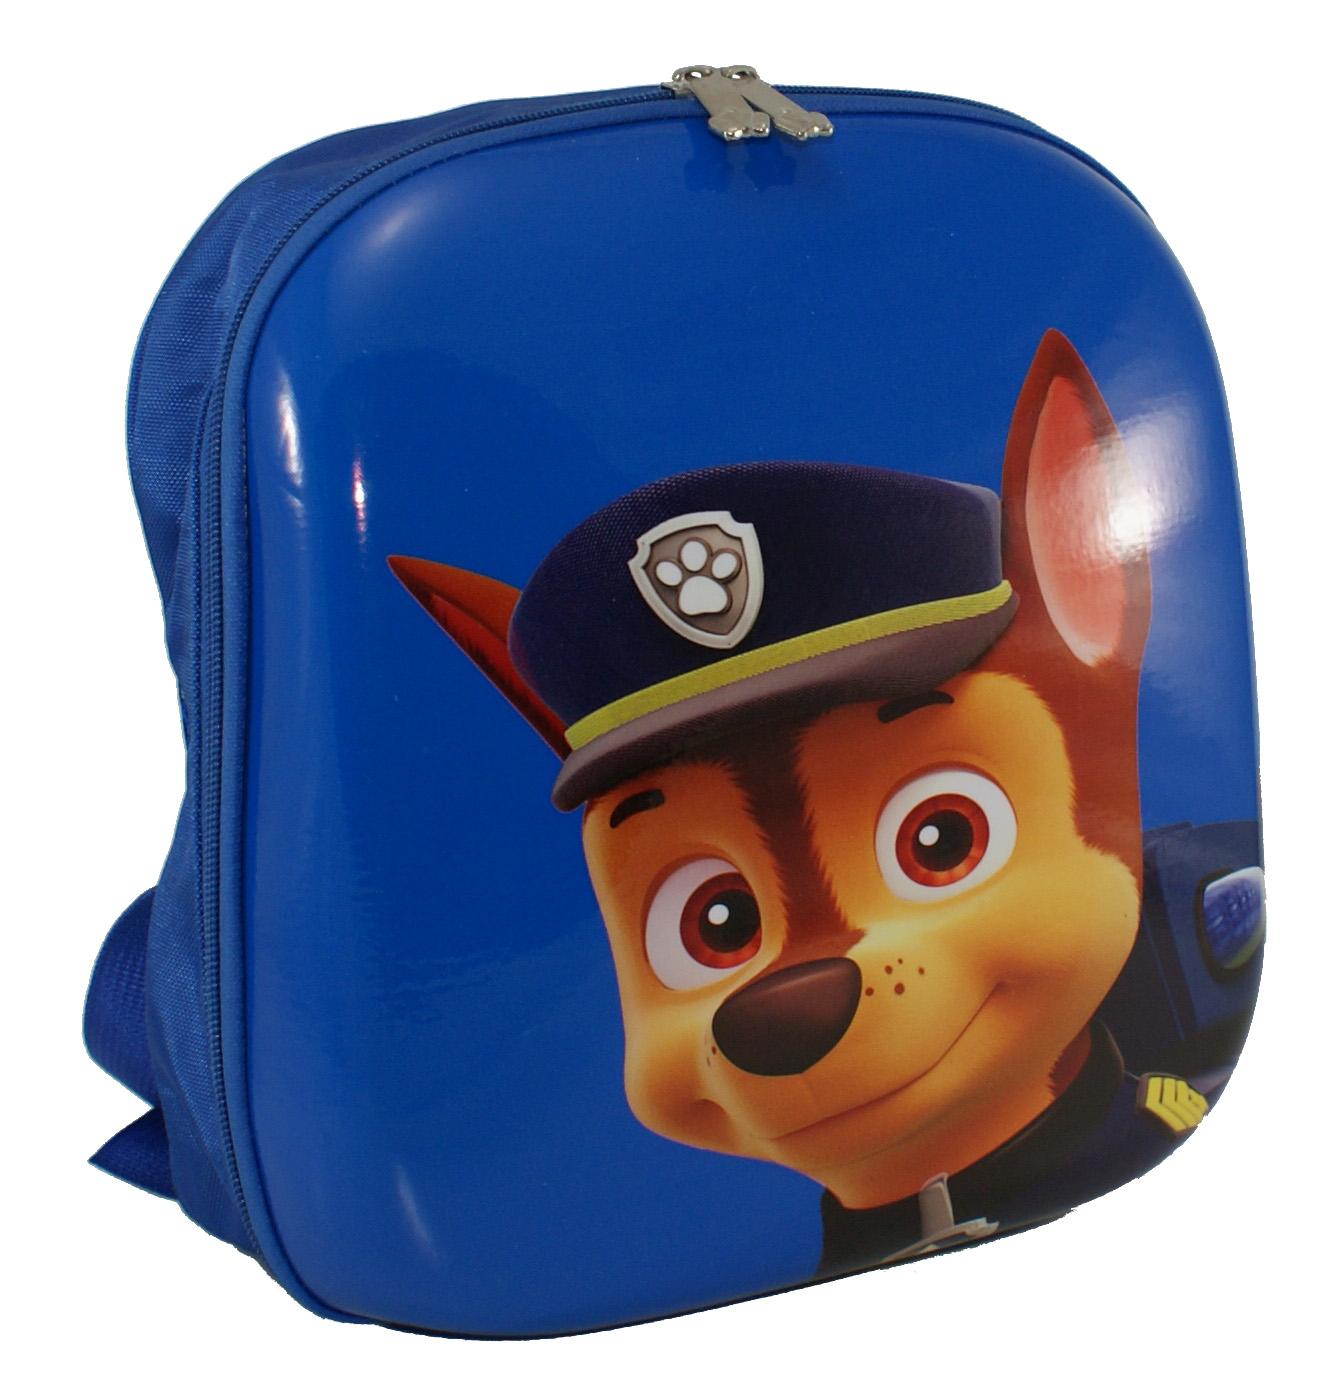 ac5240905a Παιδική τσάντα πλάτης Bartuggi 718-081301 σε μπλε χρώμα έως 6 άτοκες δόσεις